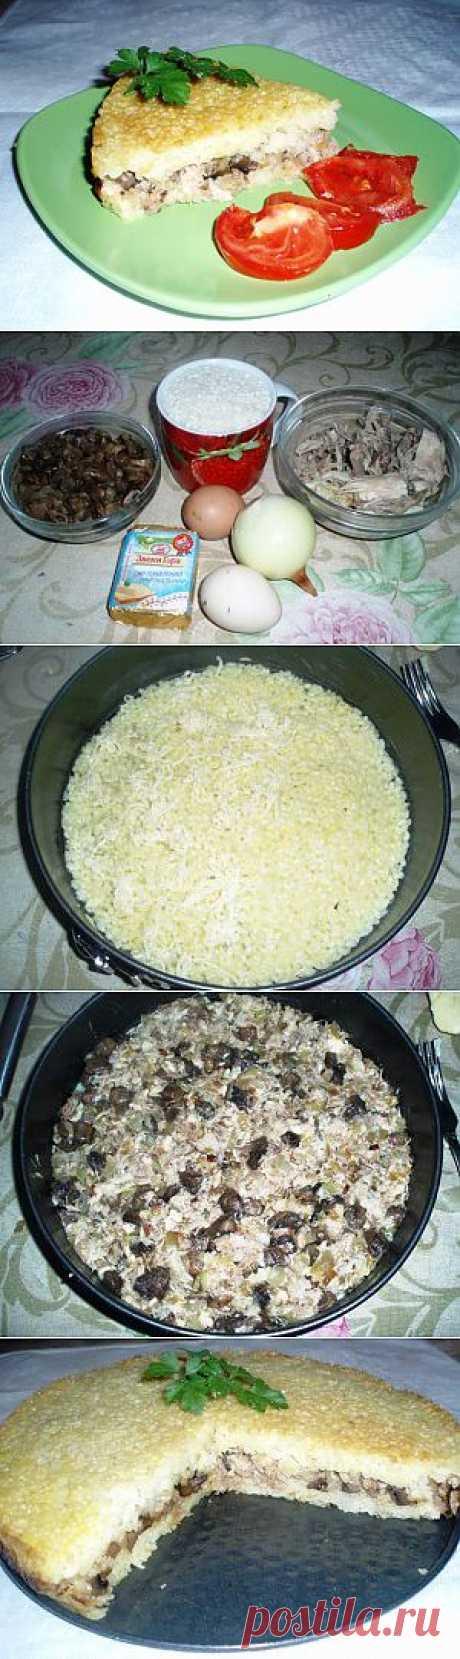 Запеканки | Домашняя еда